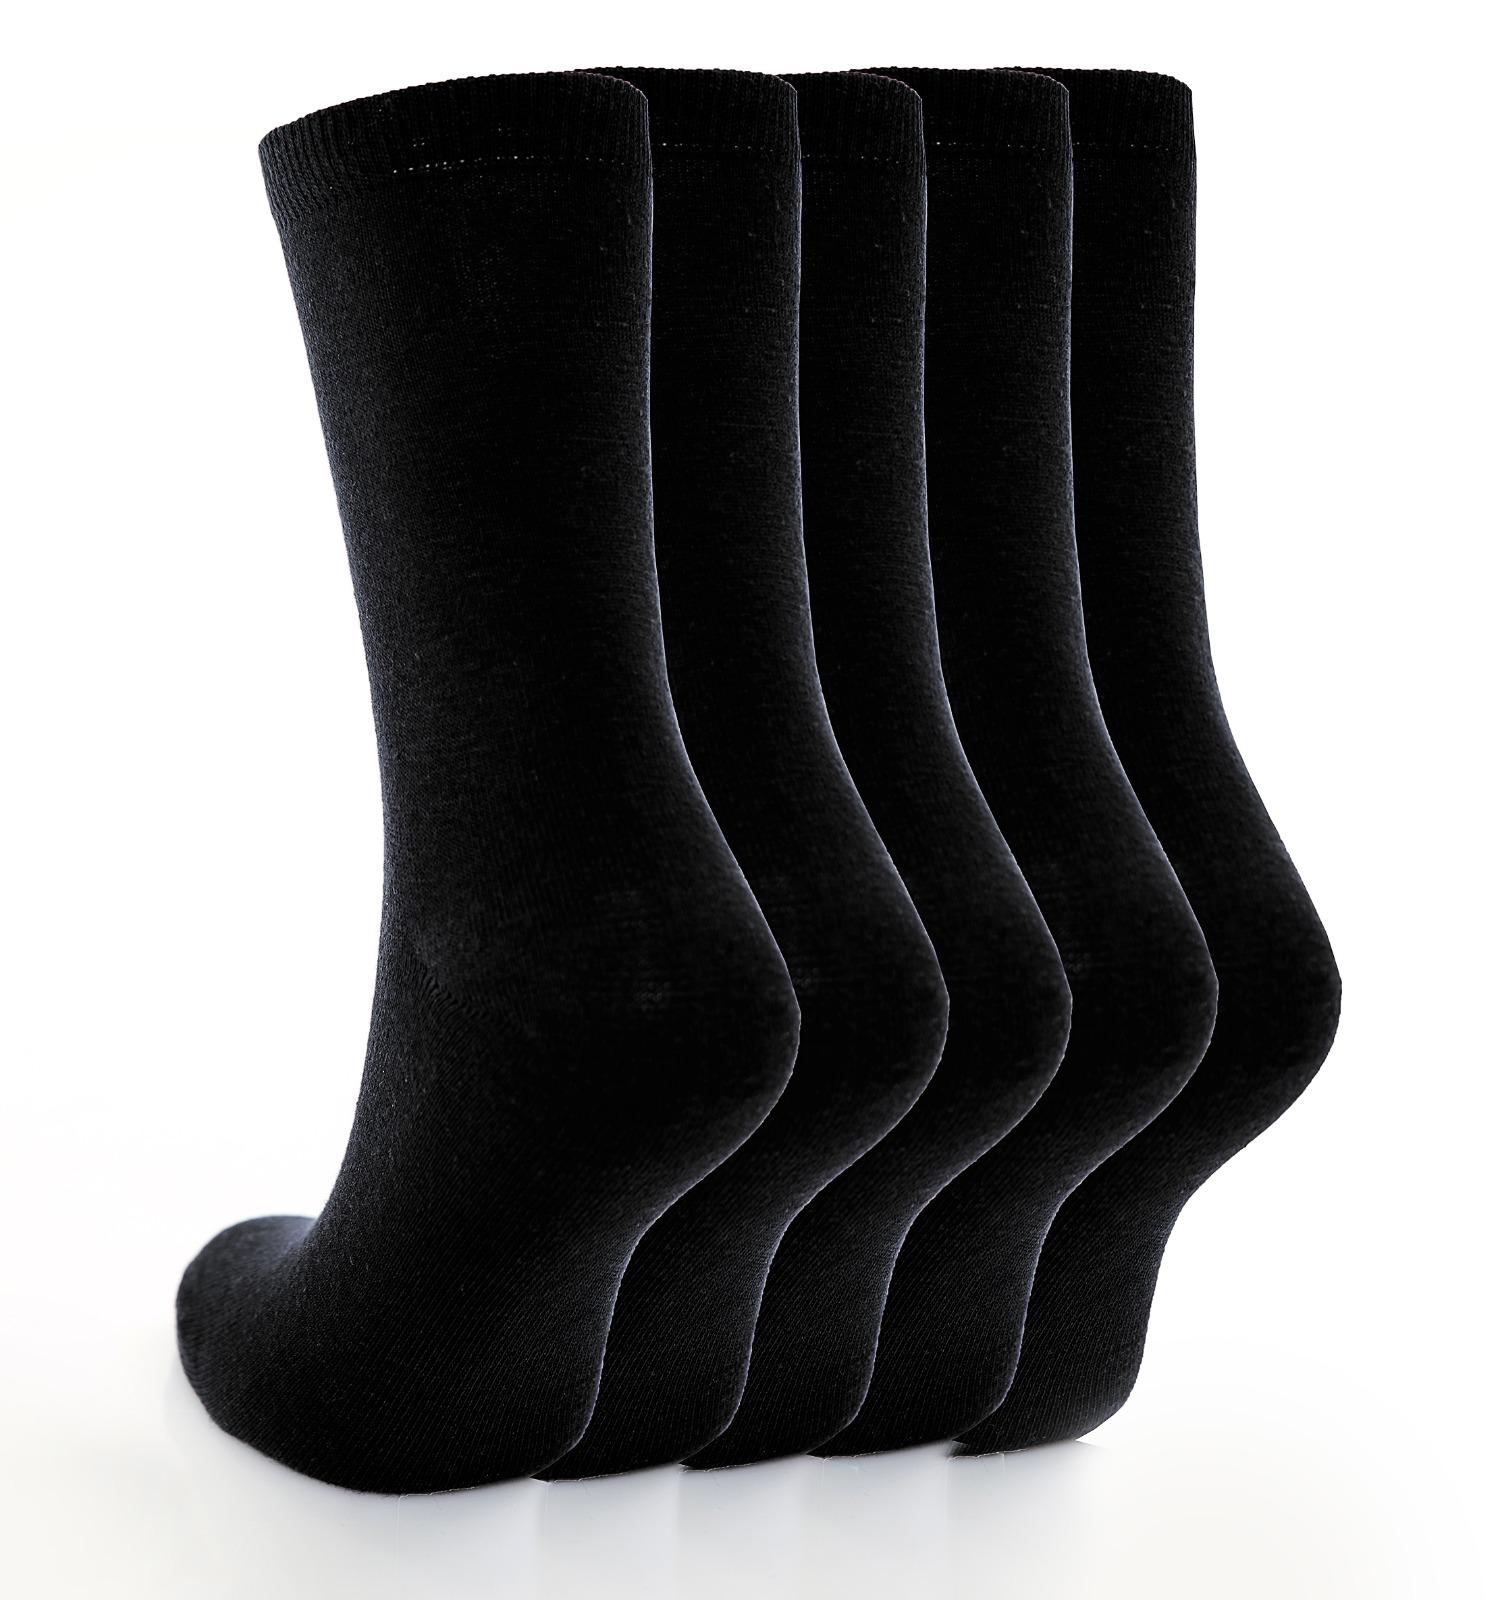 Children's 5pk Plain Black Cotton Rich Socks